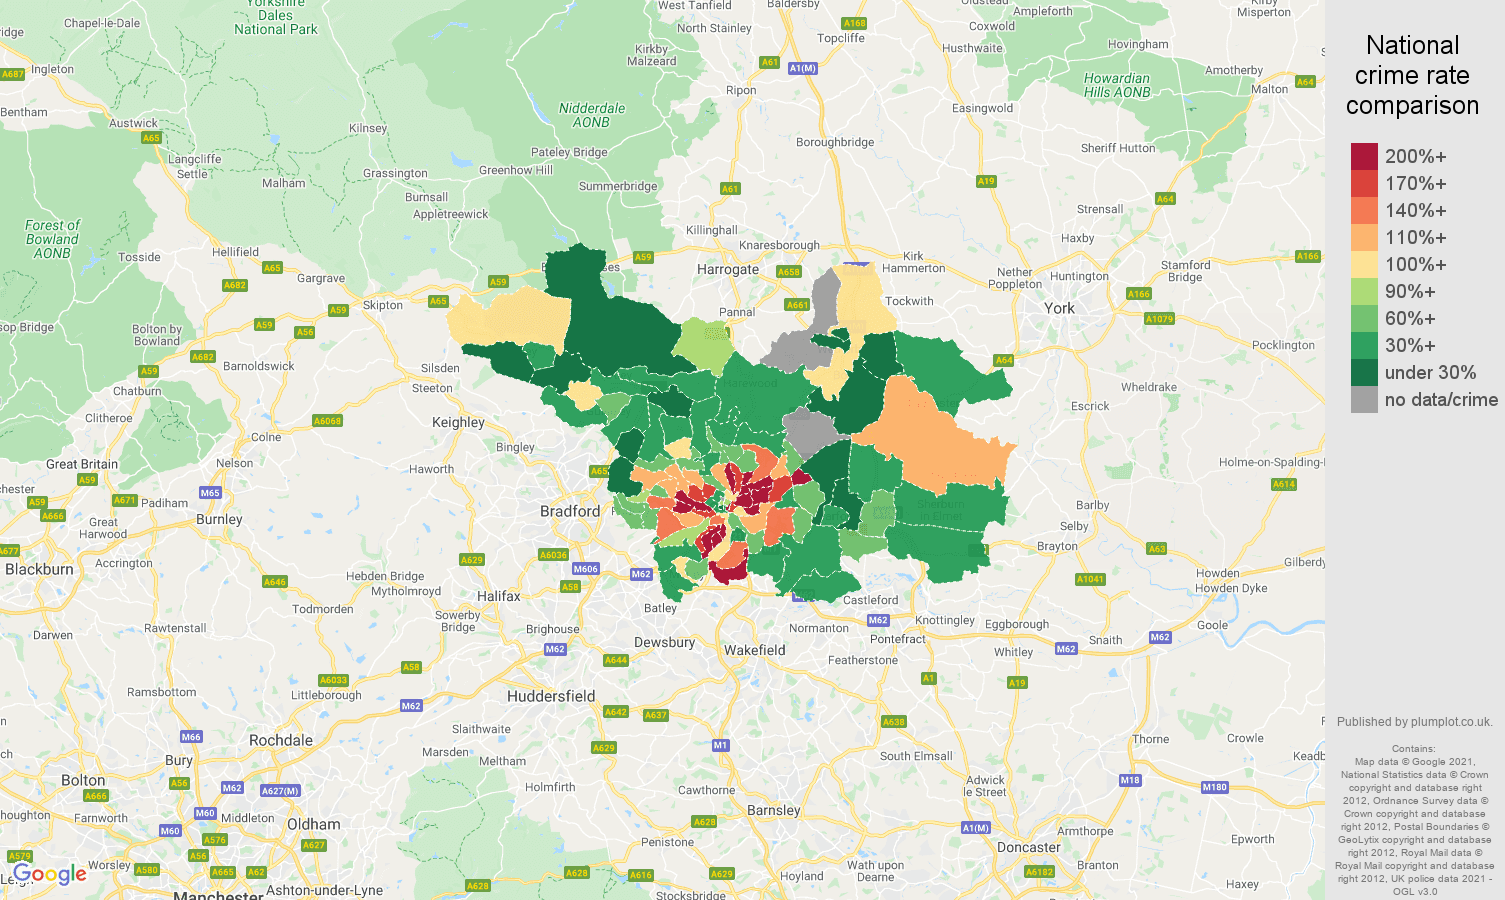 Leeds drugs crime rate comparison map